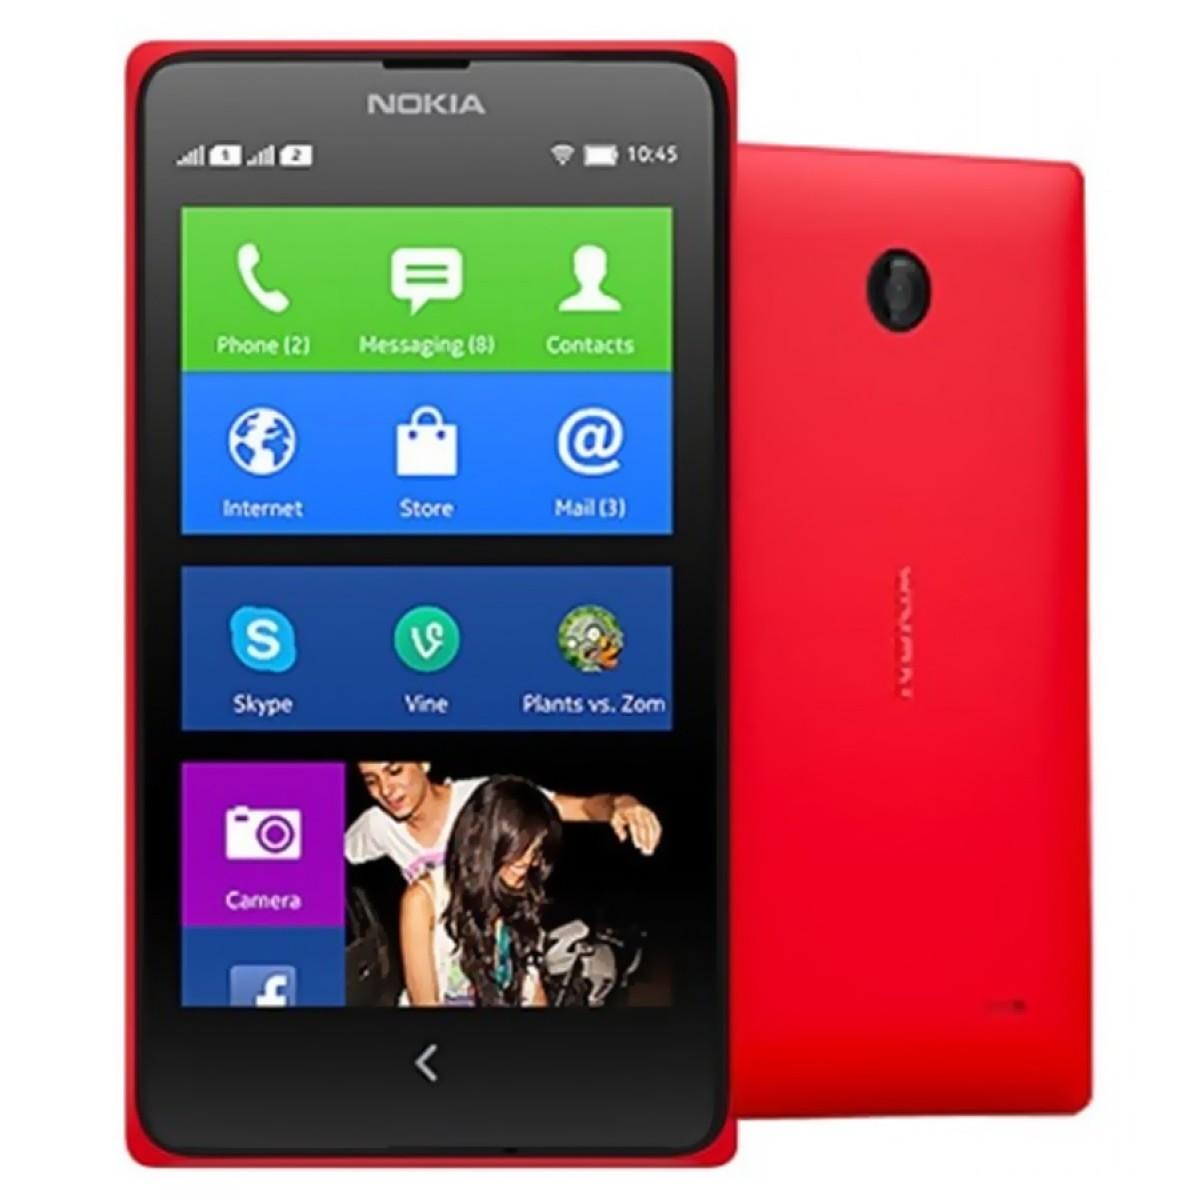 Harga Nokia X Baru dan Bekas Pertengahan September 2014